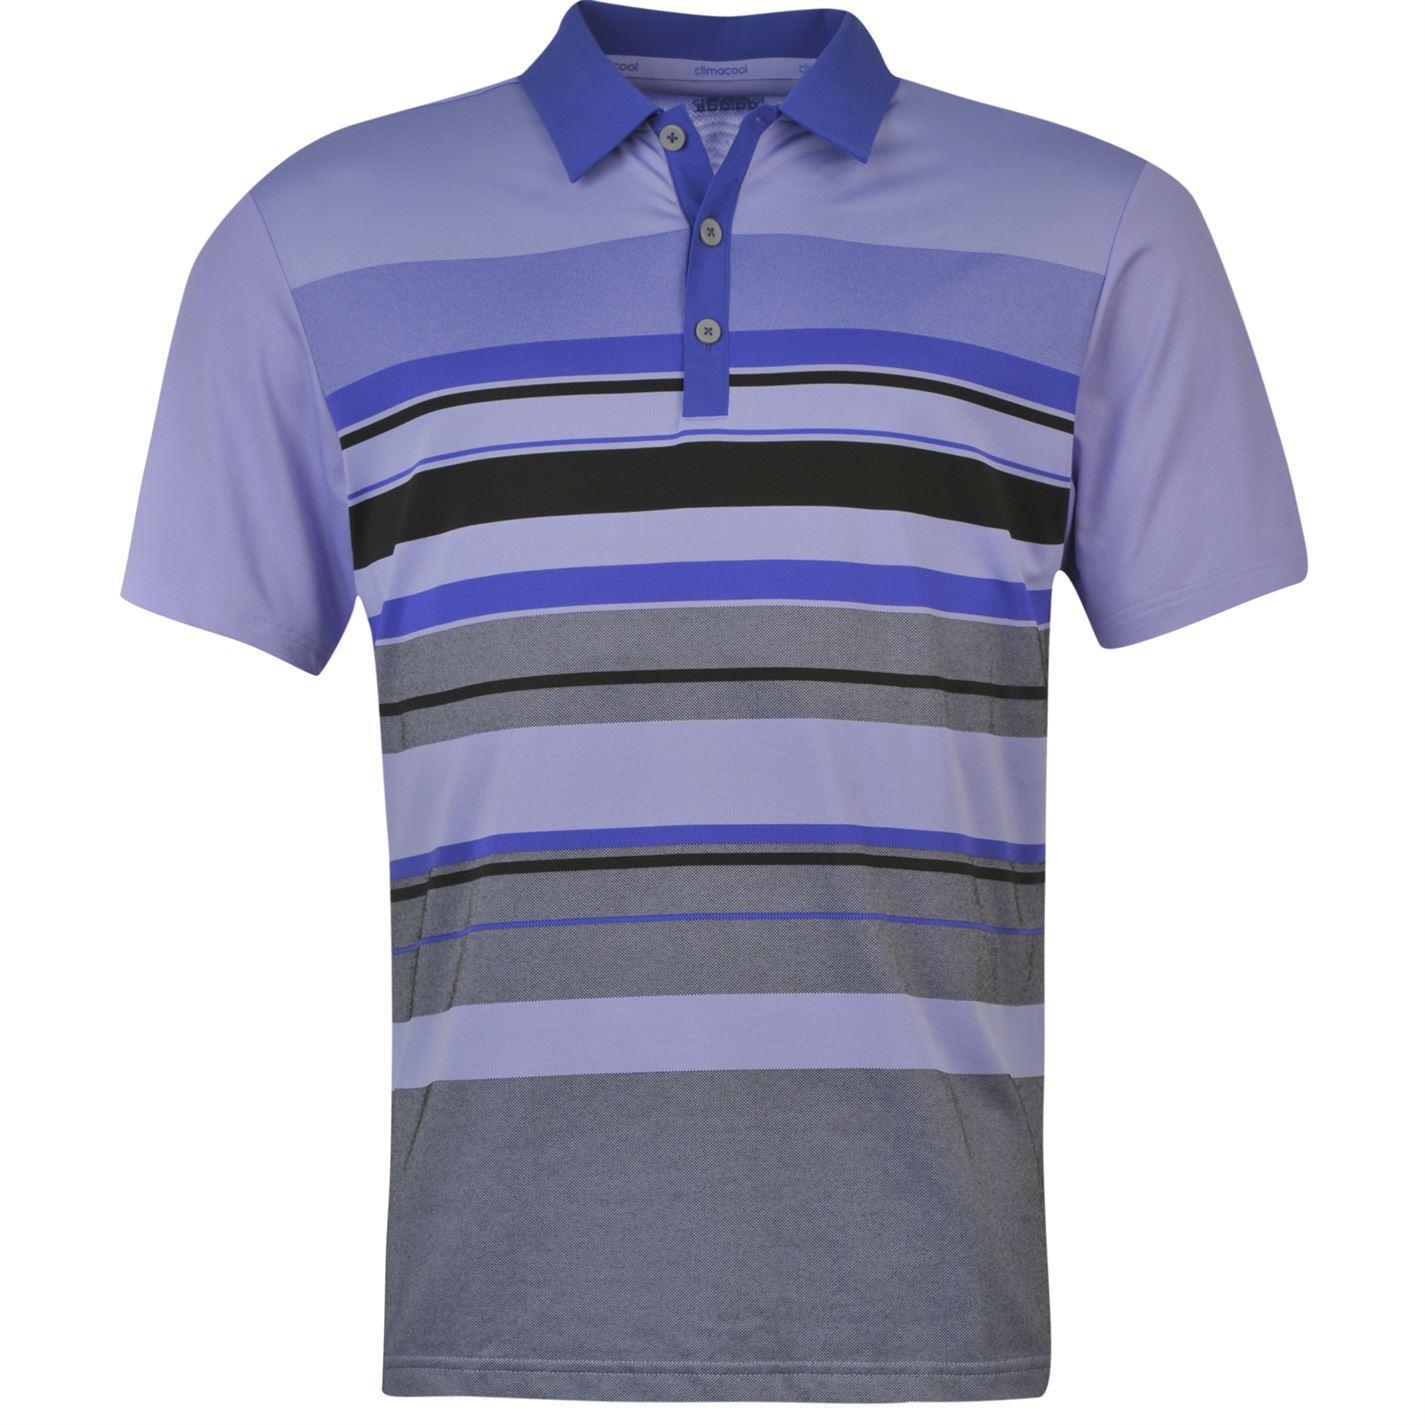 Striped Golf Polo Shirt Mens Light Purple Collared T Shirt Top Ebay